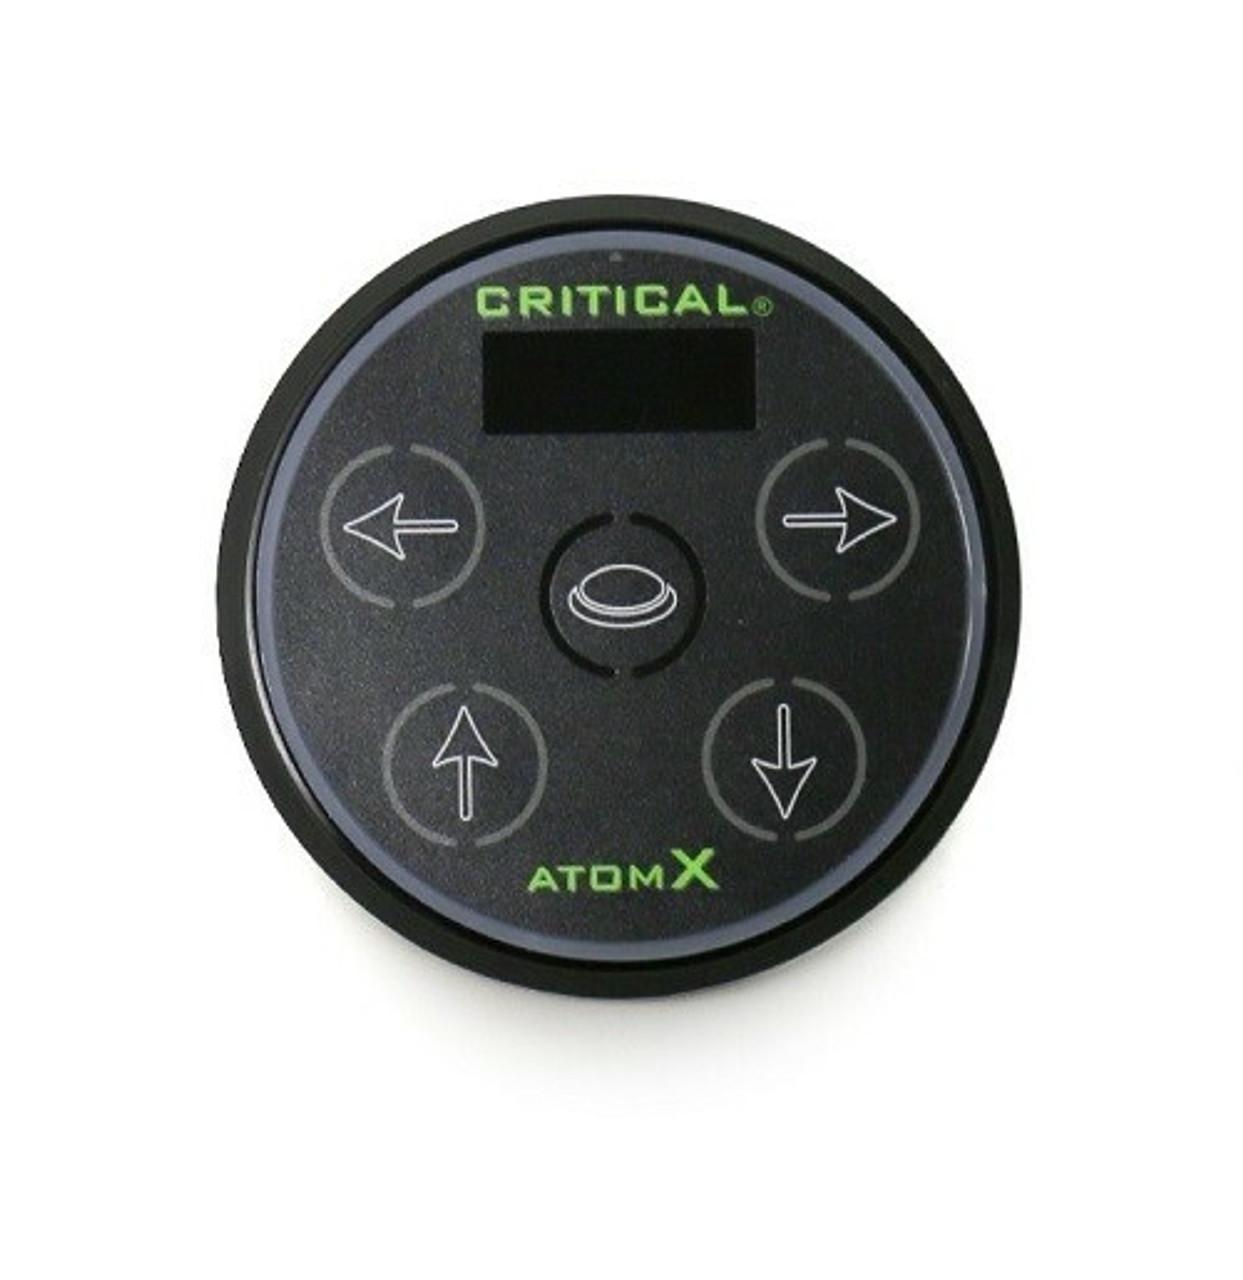 Critical Tattoo Atom X Power Supply - Black - Electrum Supply